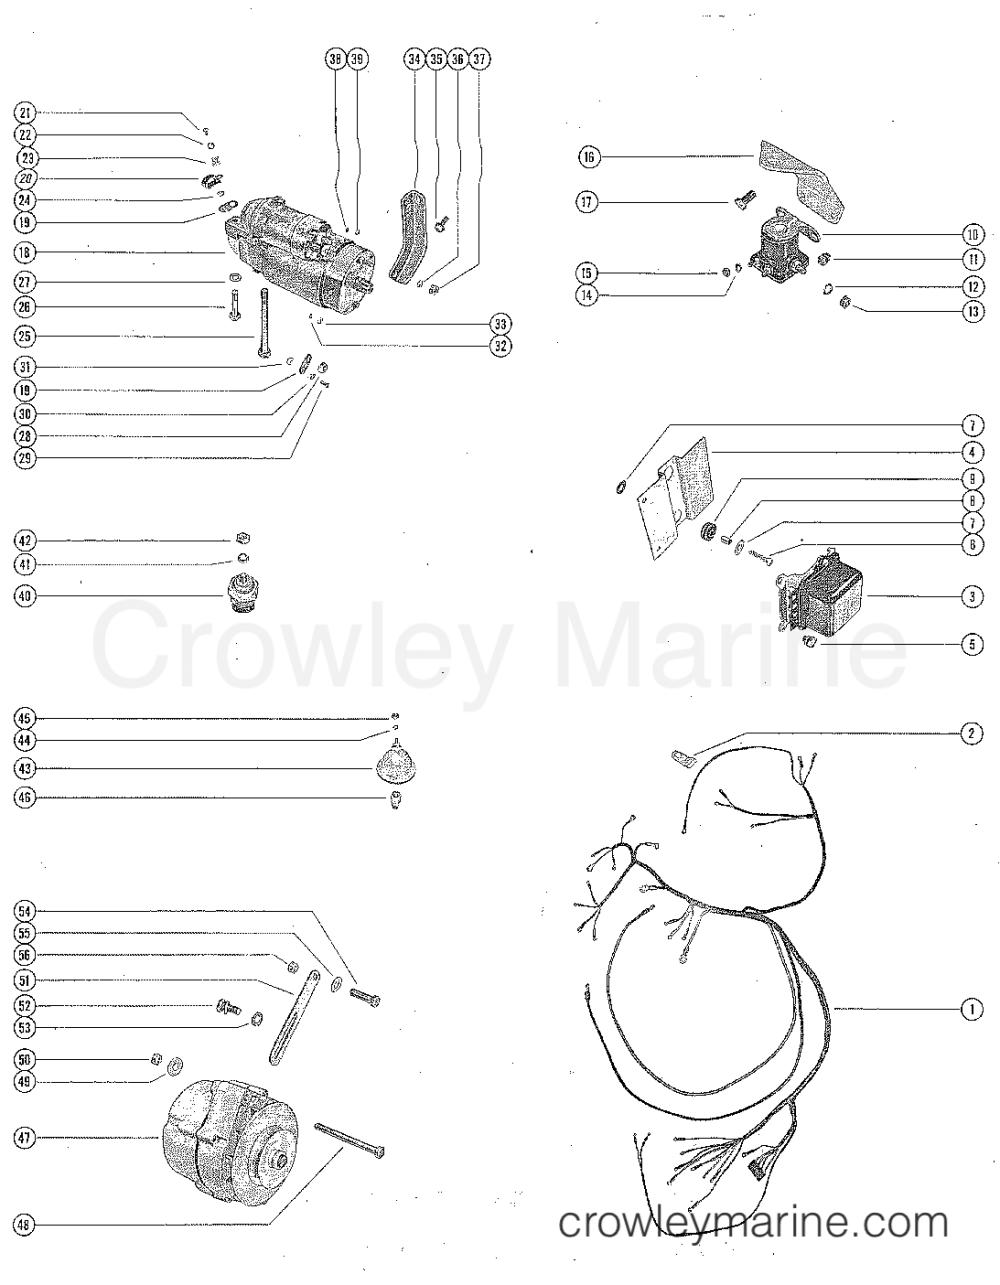 medium resolution of serial range mercruiser 190 gm 283 v 8 1963 1964 1564539 thru 1730903